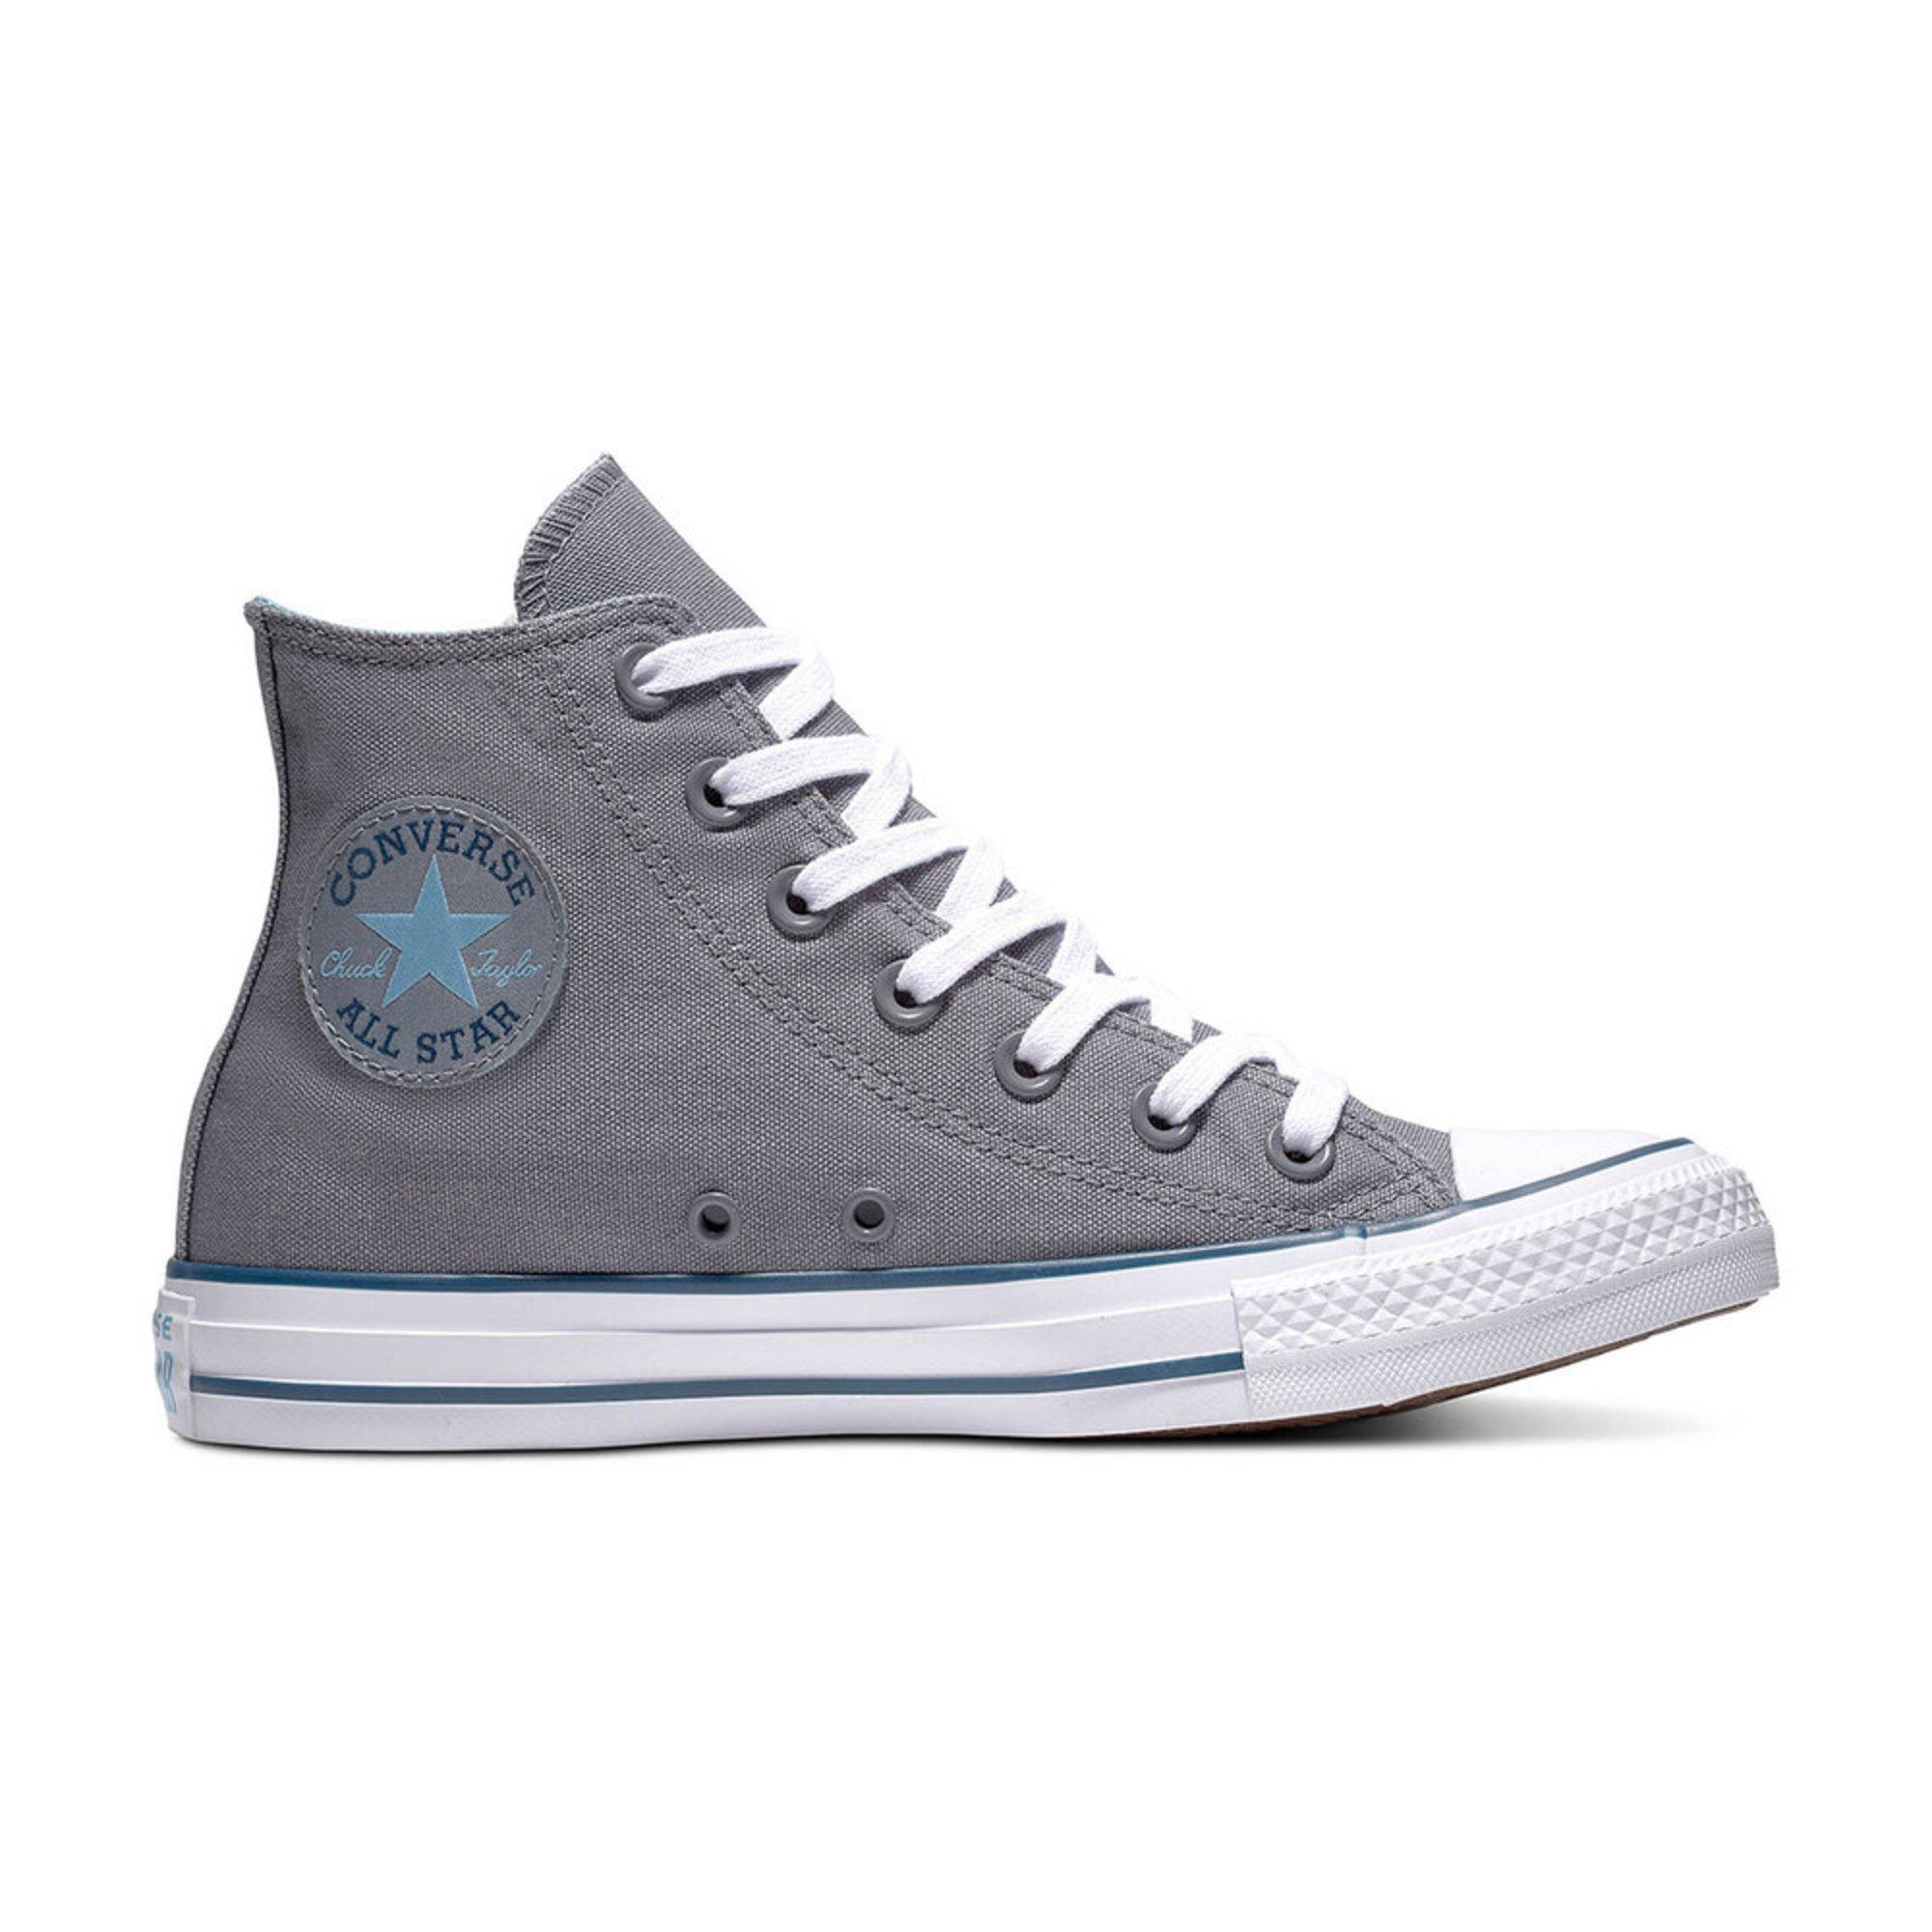 81f61c35acd5 Converse. Converse Unisex Chuck Taylor All Star Hi ...